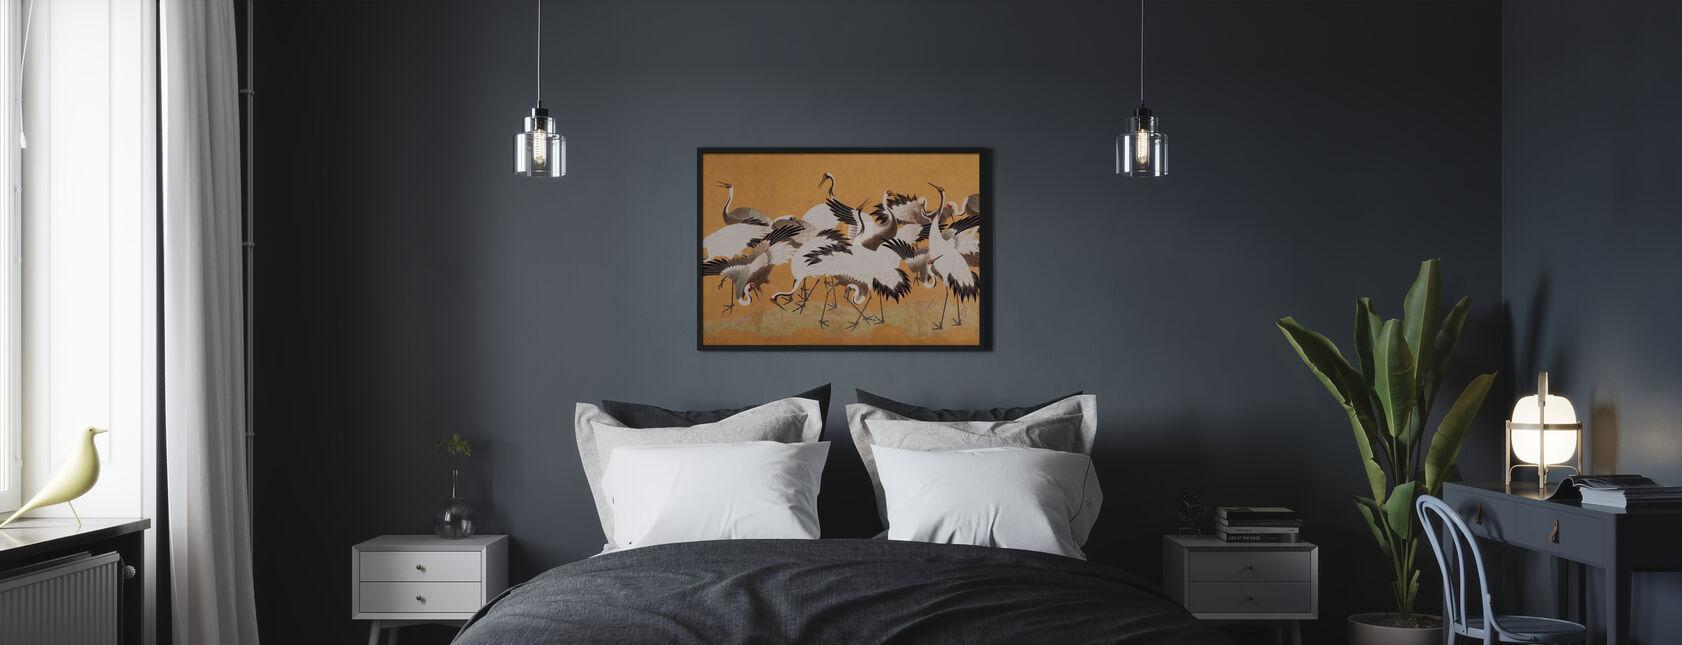 Kraan Vogels - Poster - Slaapkamer